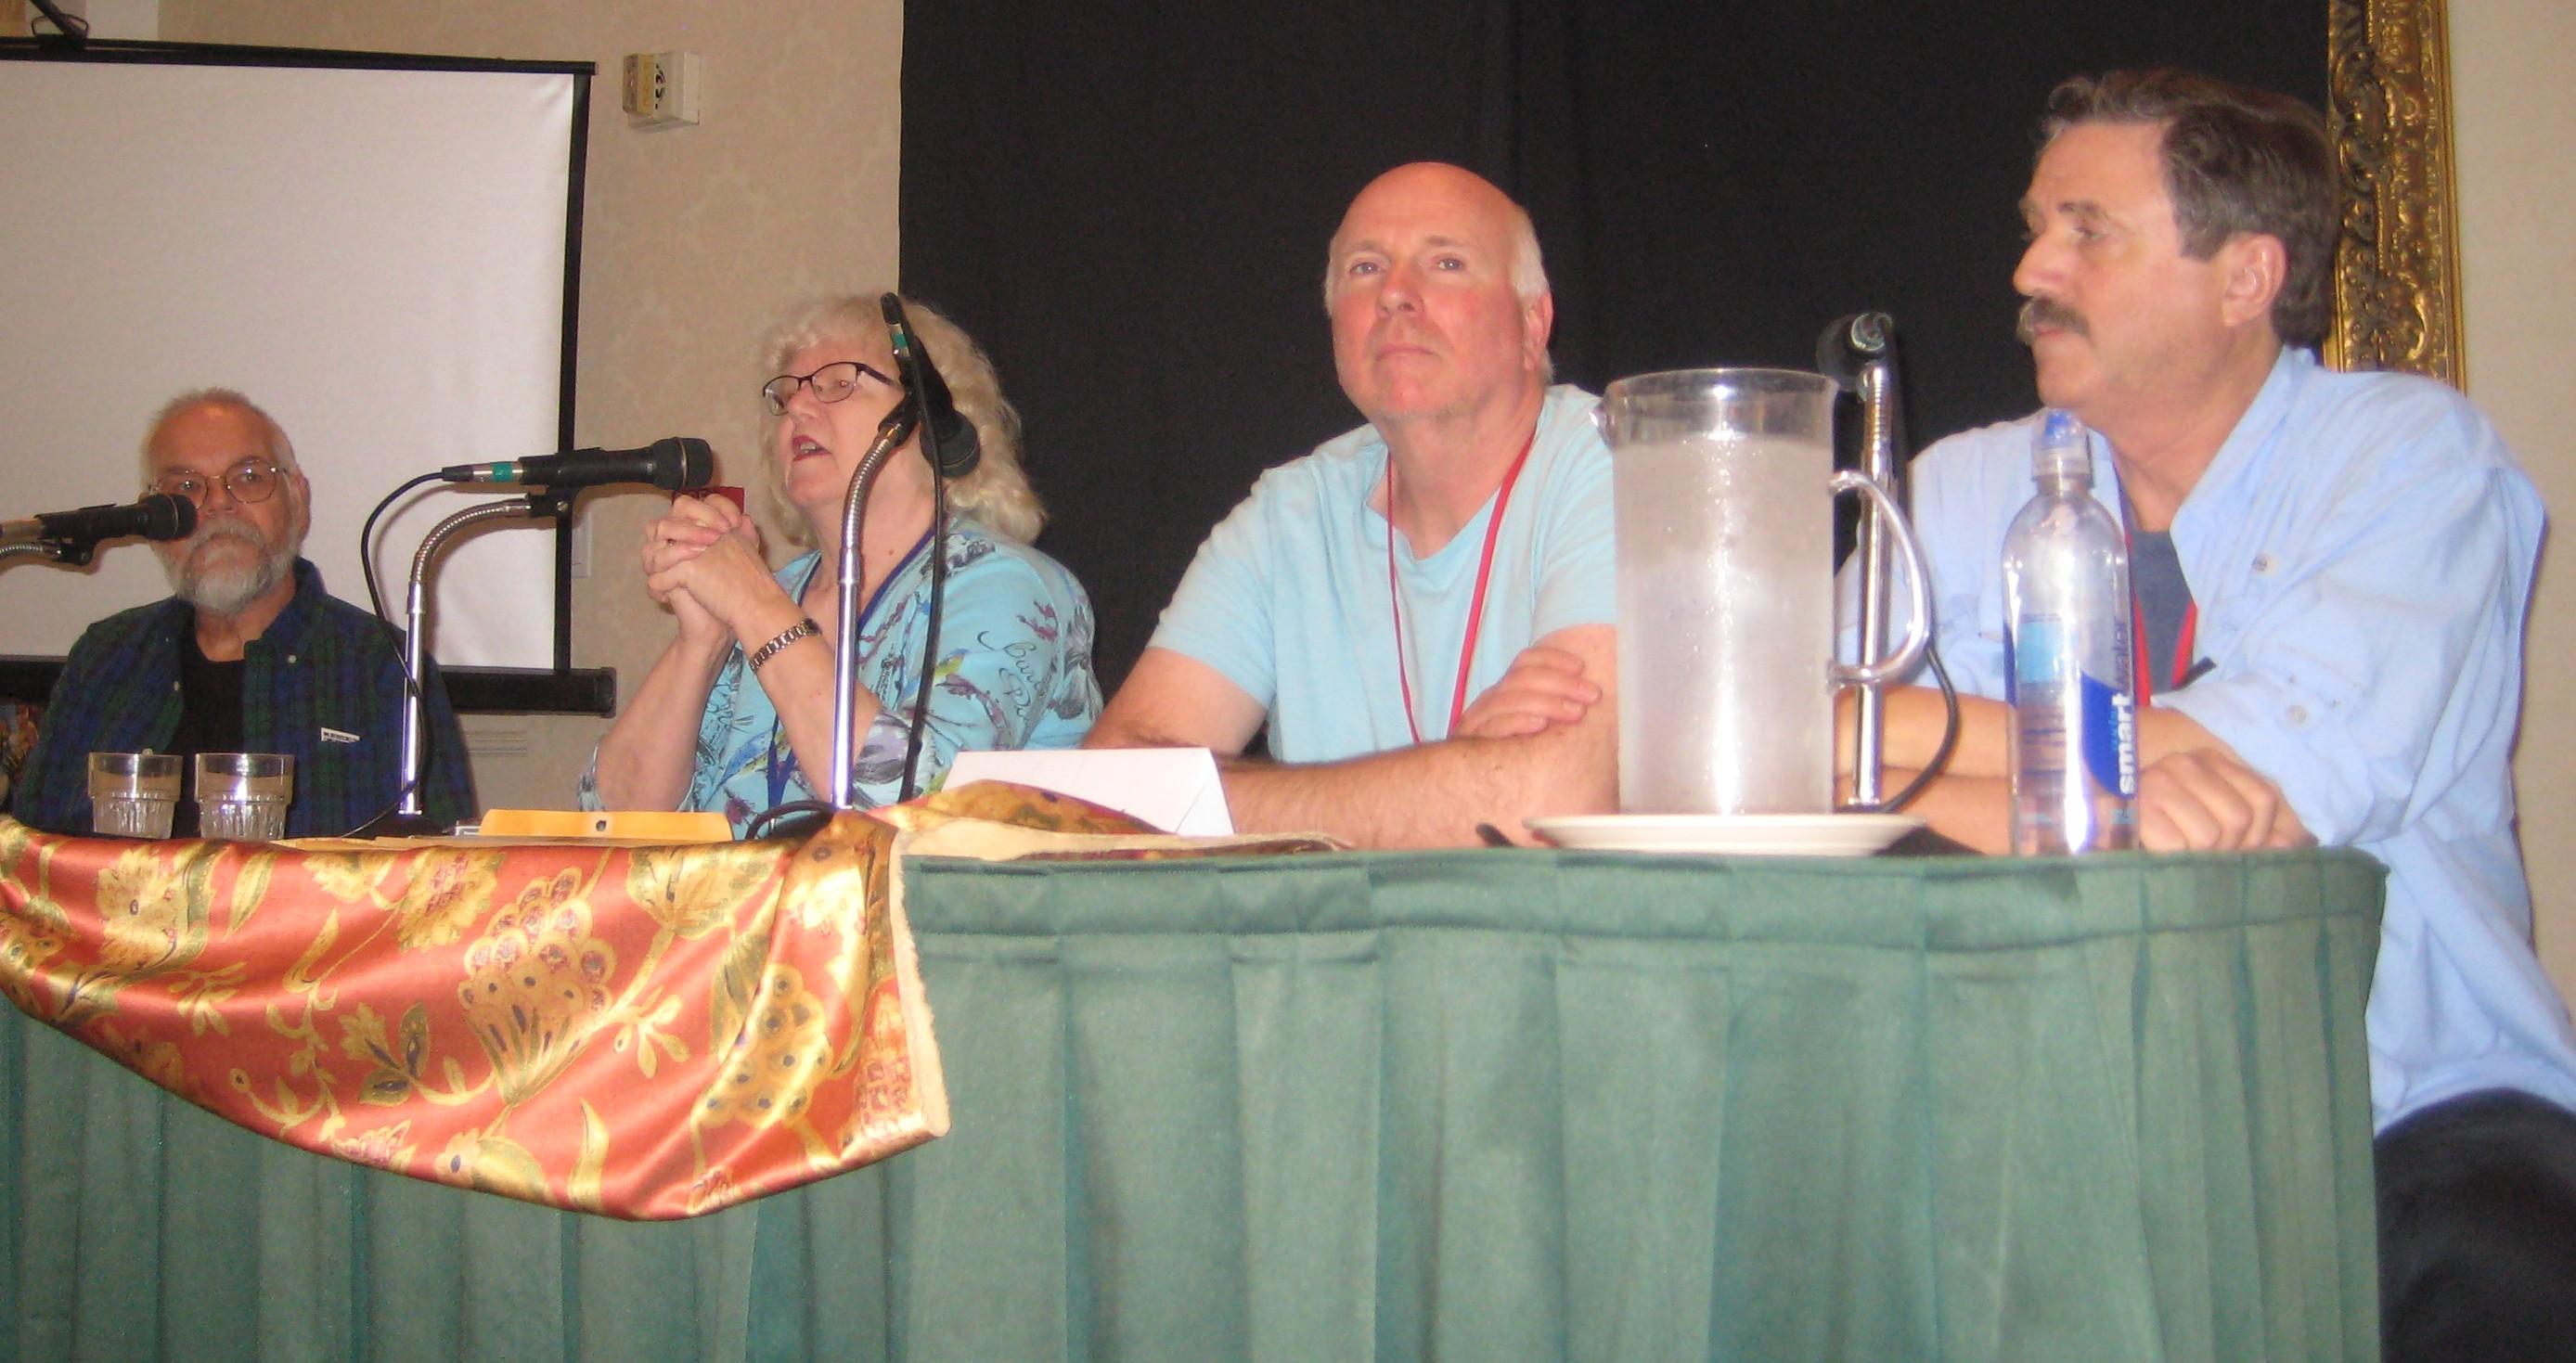 Dennis Smith, Jackie Estrada, Mike Towry and David Clark on San Diego Fandom in the 1960s panel